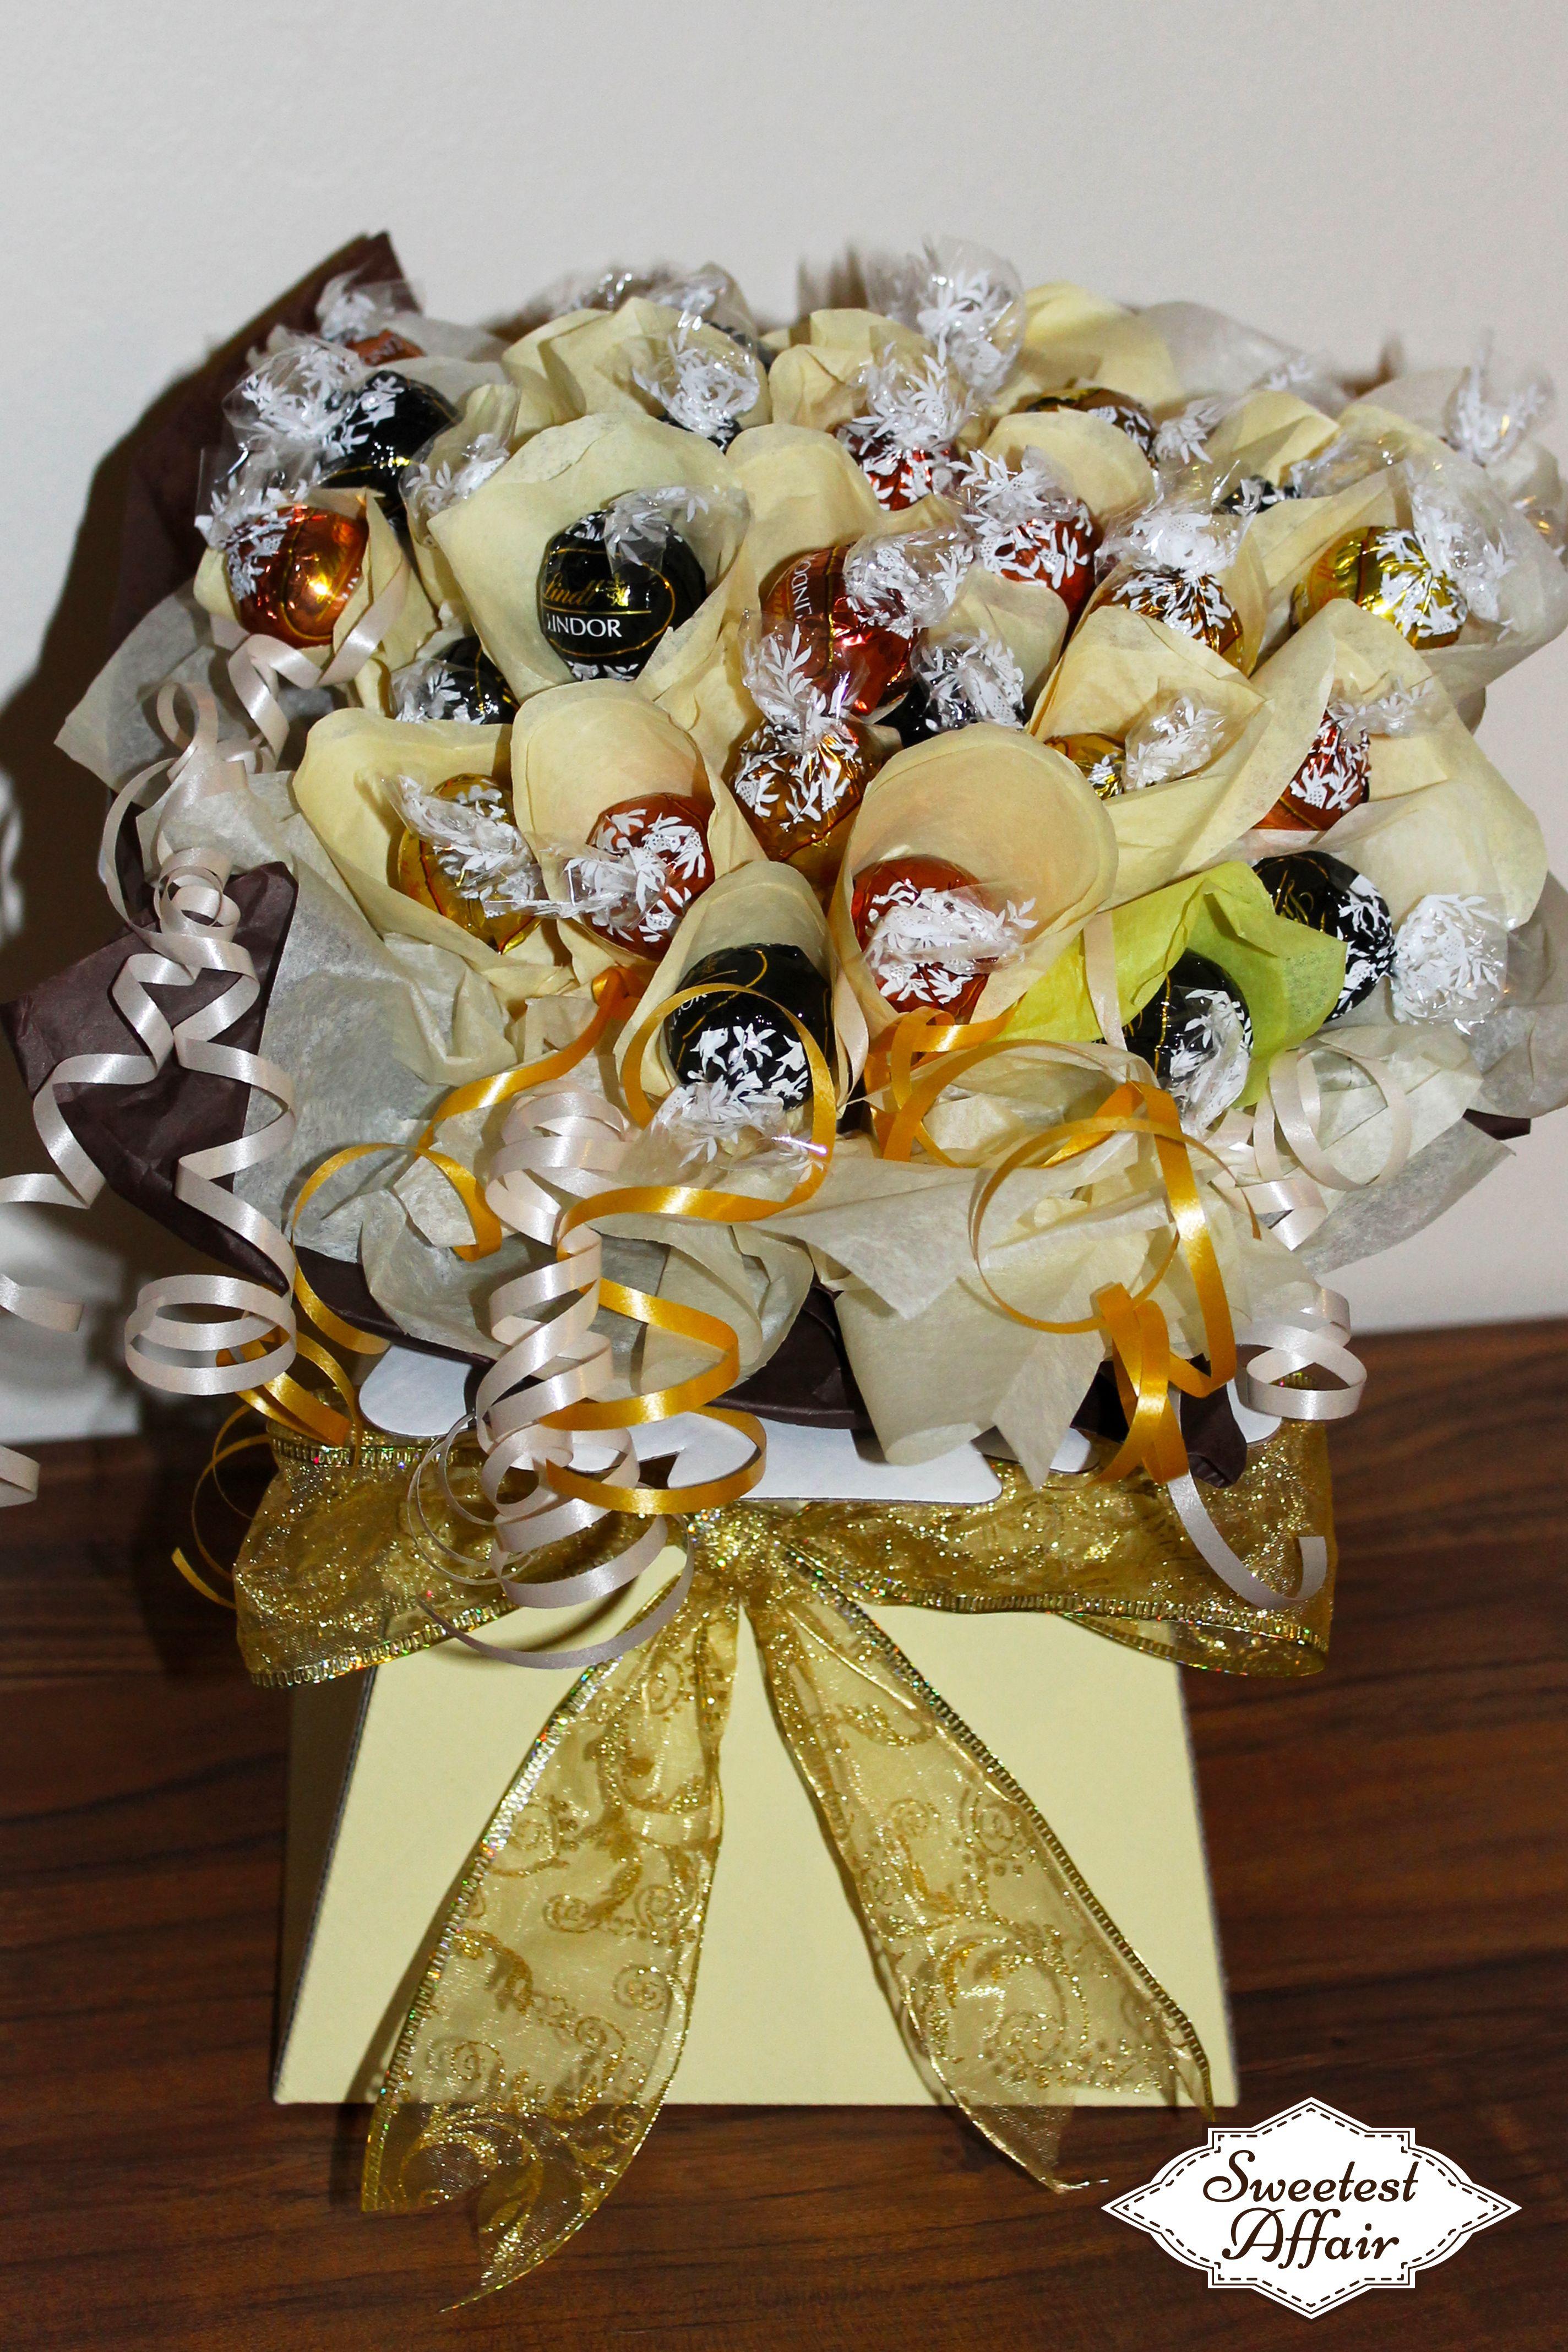 Lindt lindor chocolate truffle sweet bouquet httpebay lindt lindor chocolate truffle sweet bouquet httpebay izmirmasajfo Images